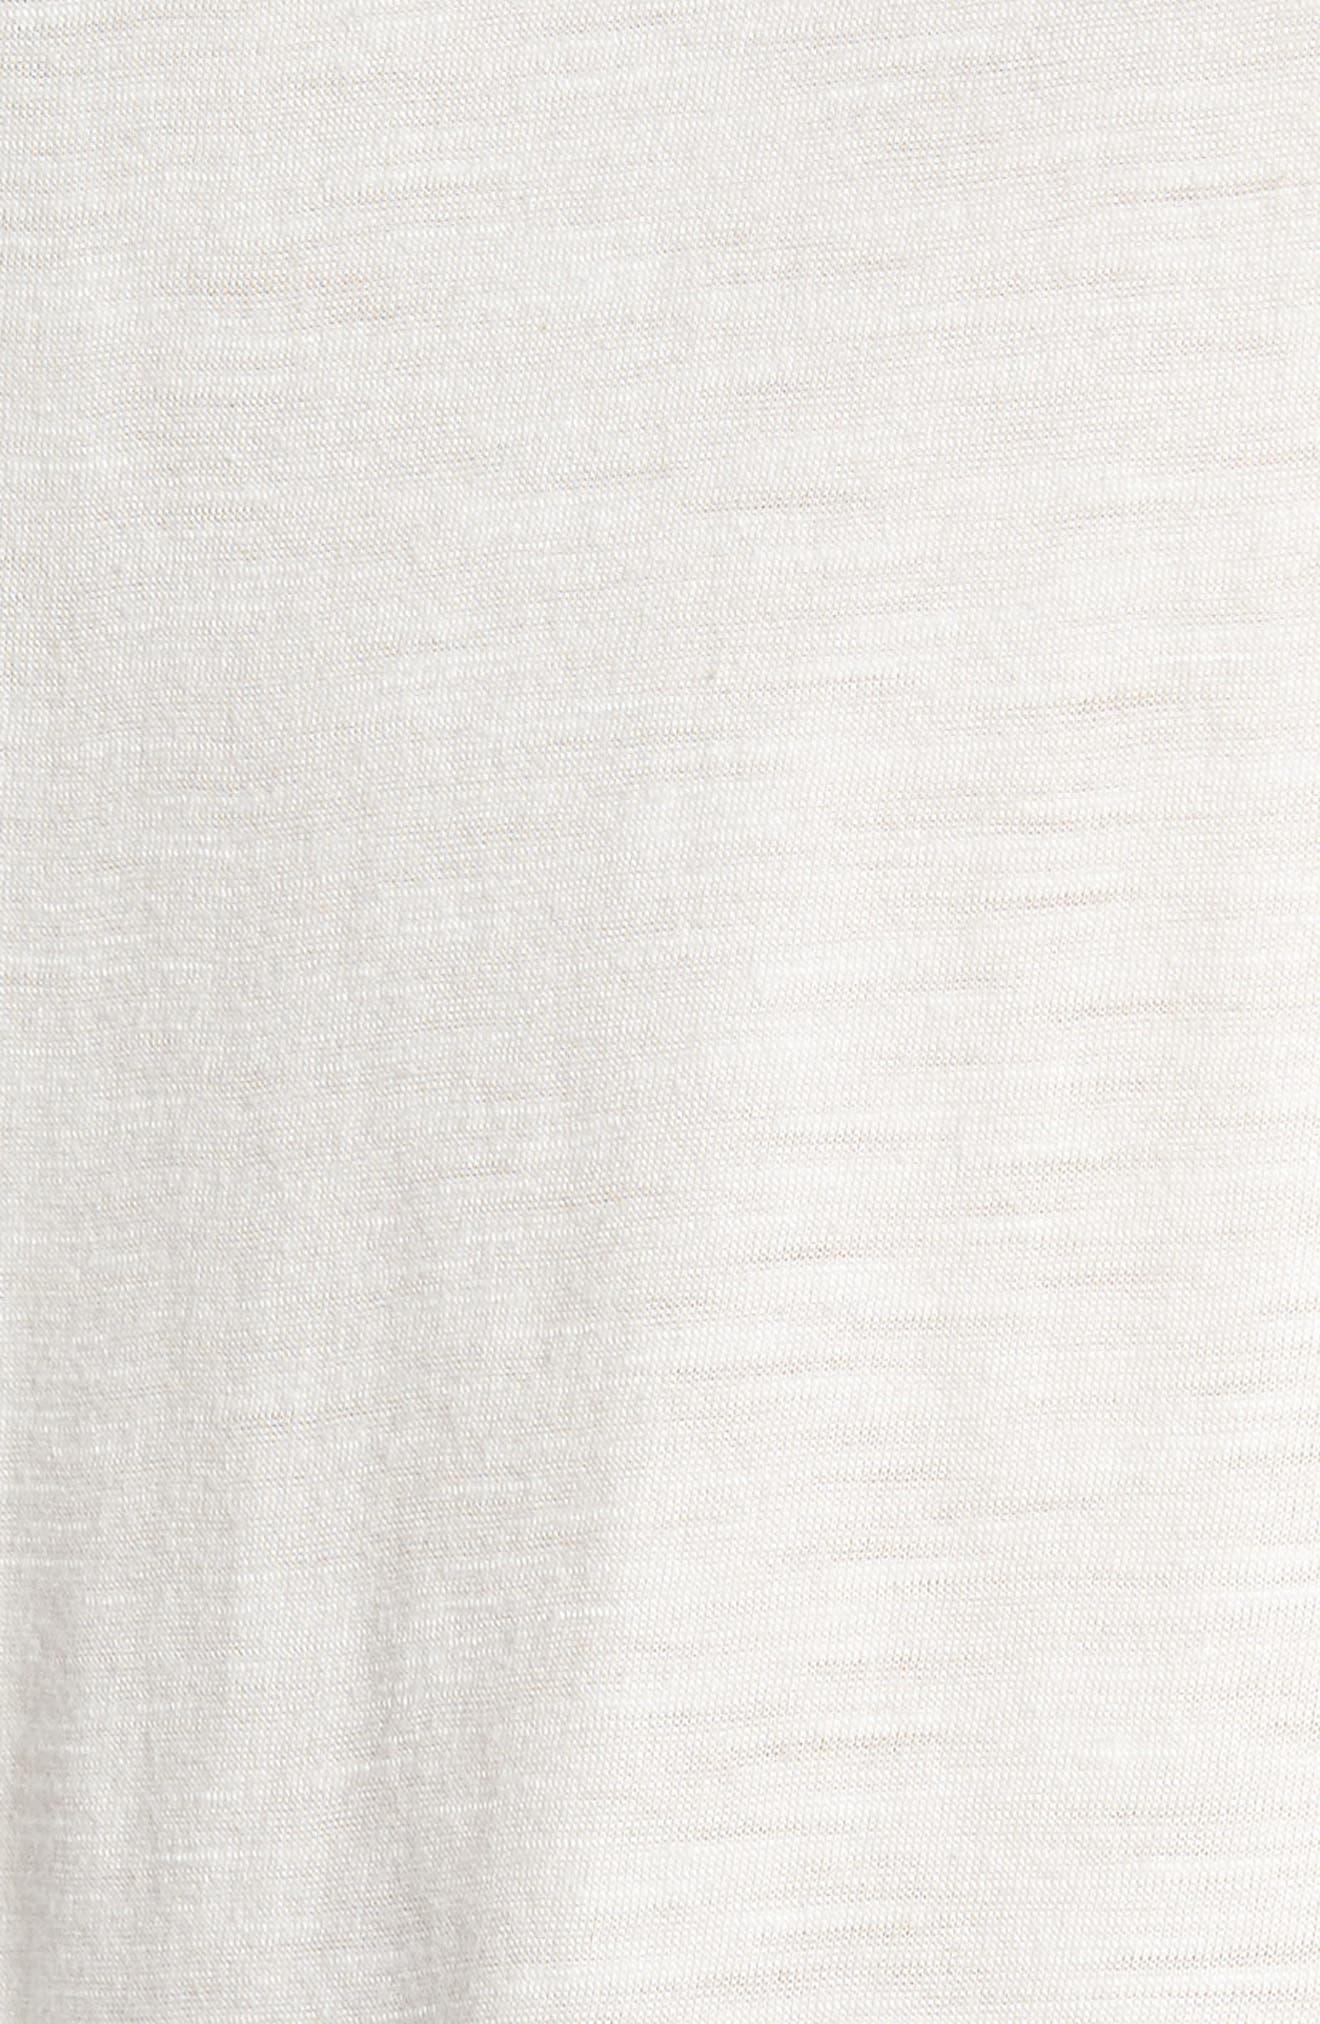 Sleeveless Tulle Trim Tank Top,                             Alternate thumbnail 6, color,                             Ivory